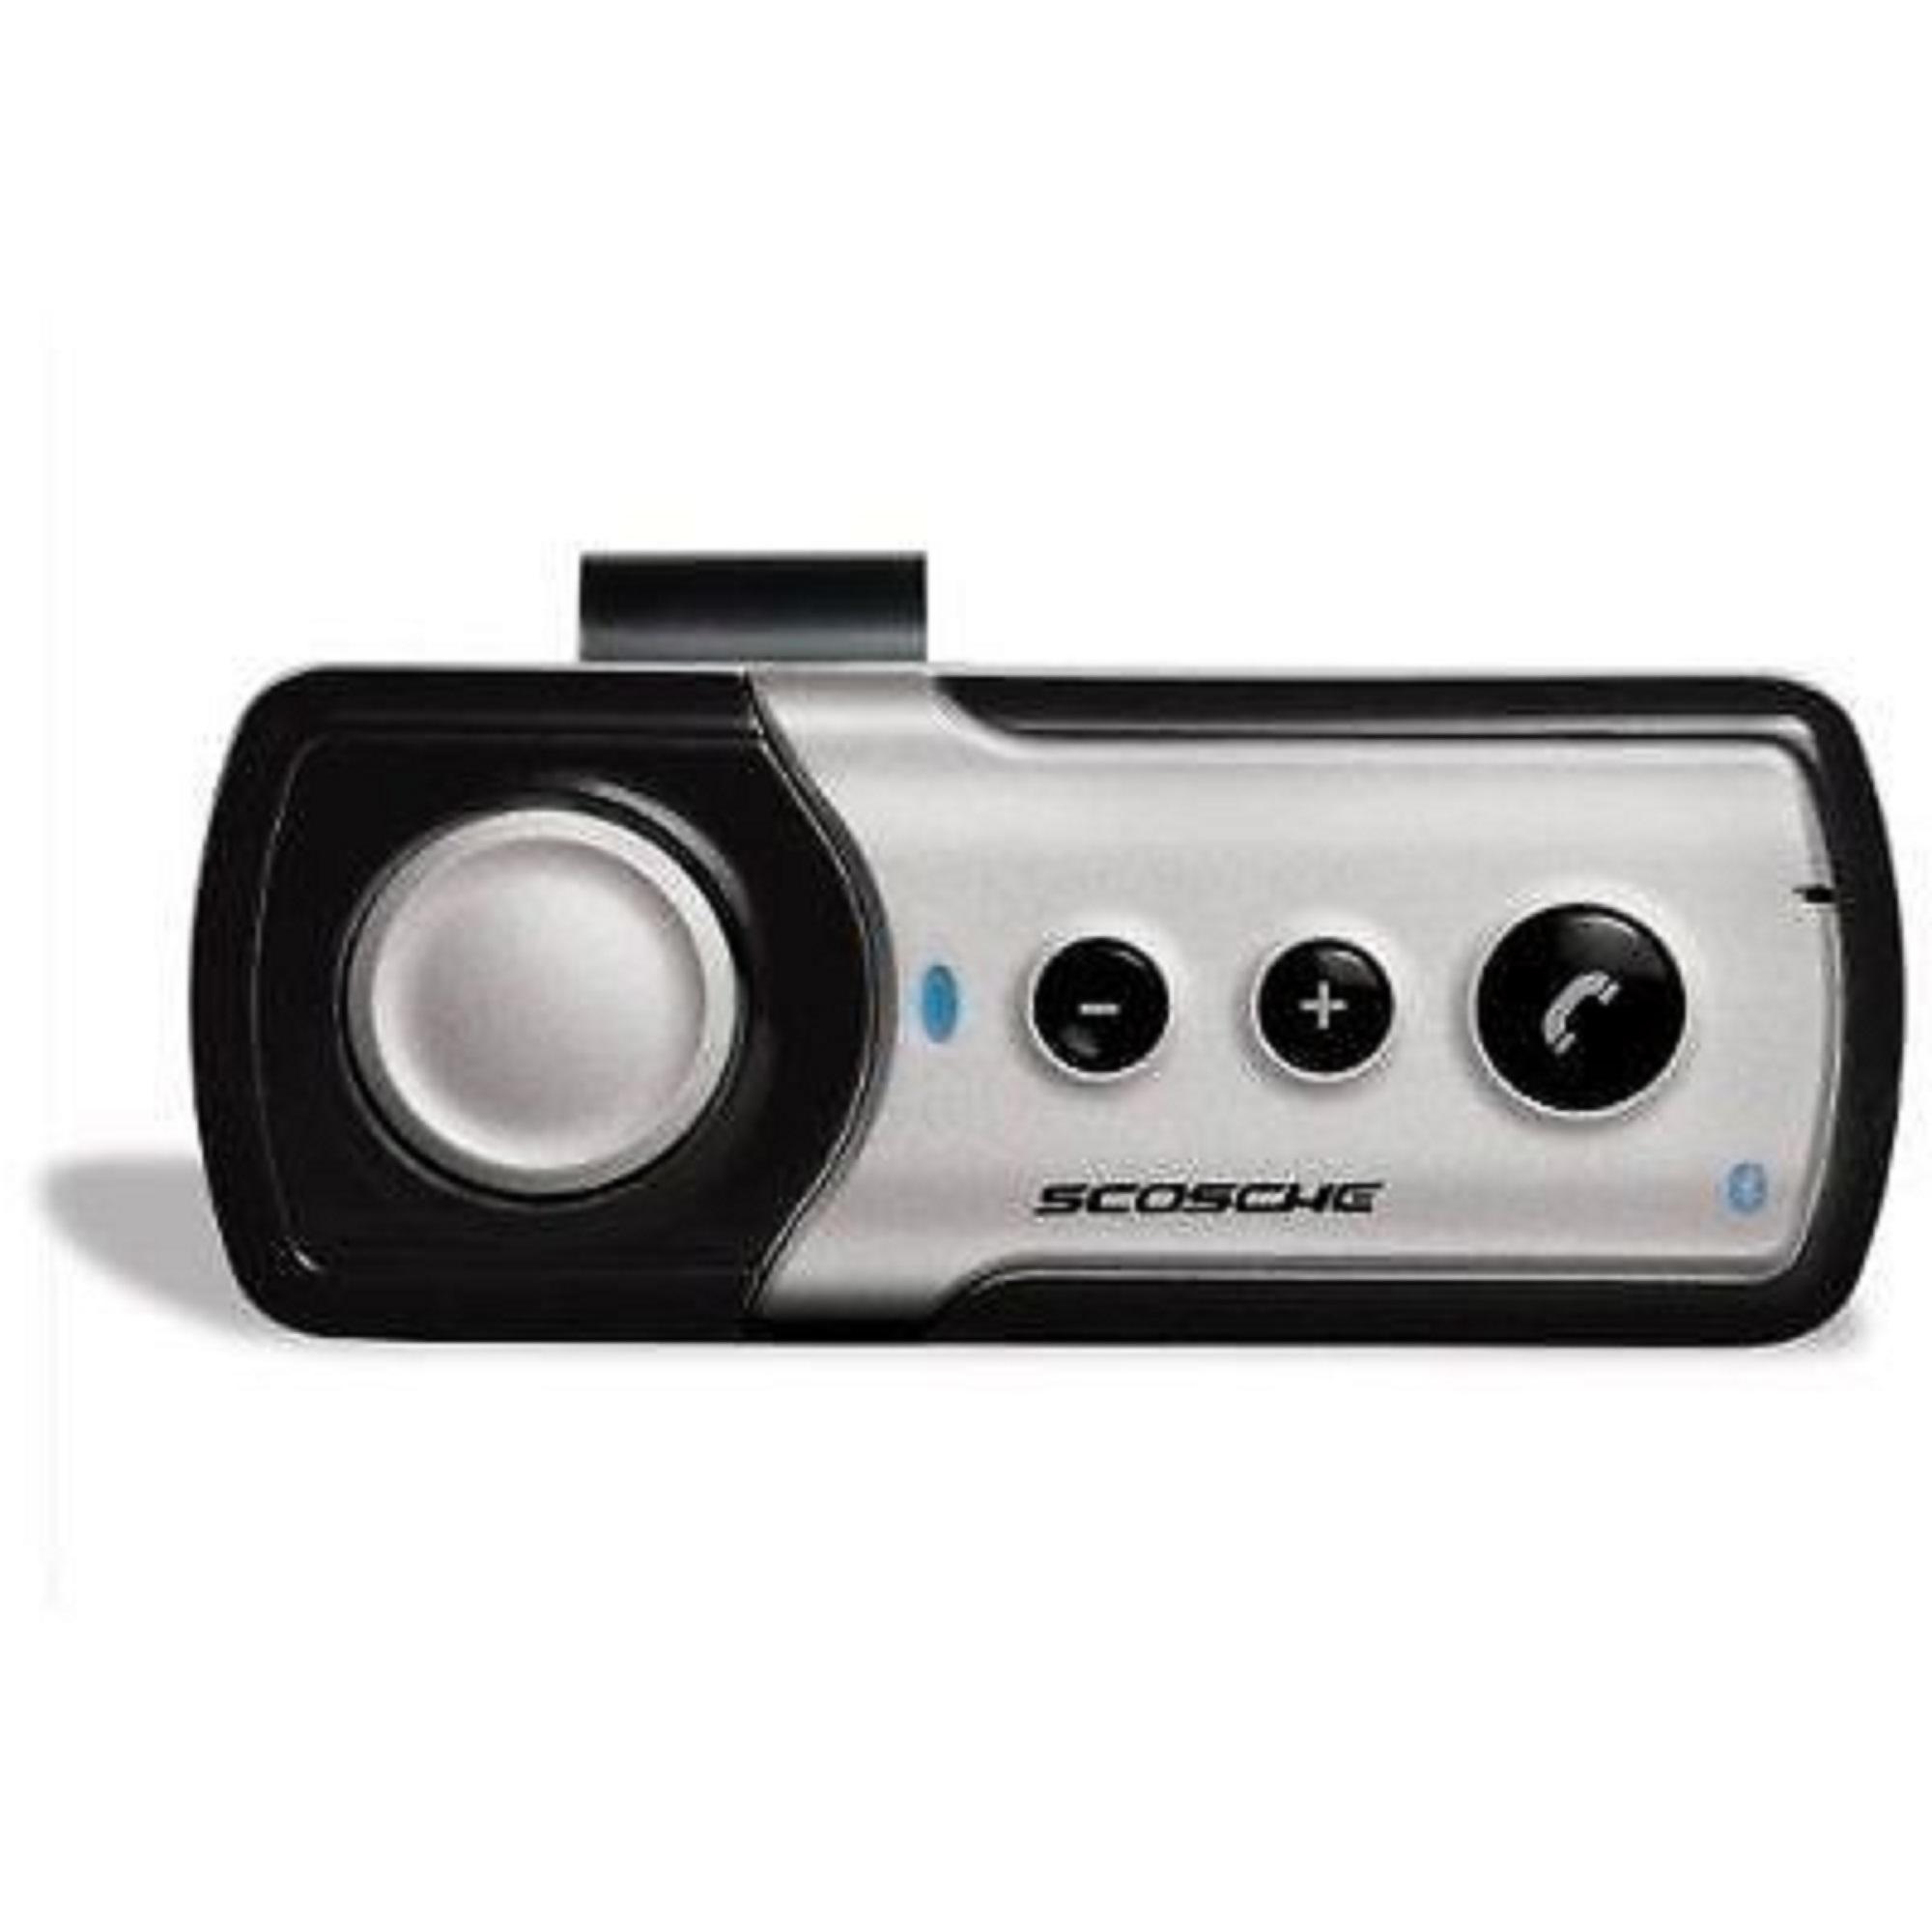 Bluetooth Handsfree Speakerphone CBHV2 Portable